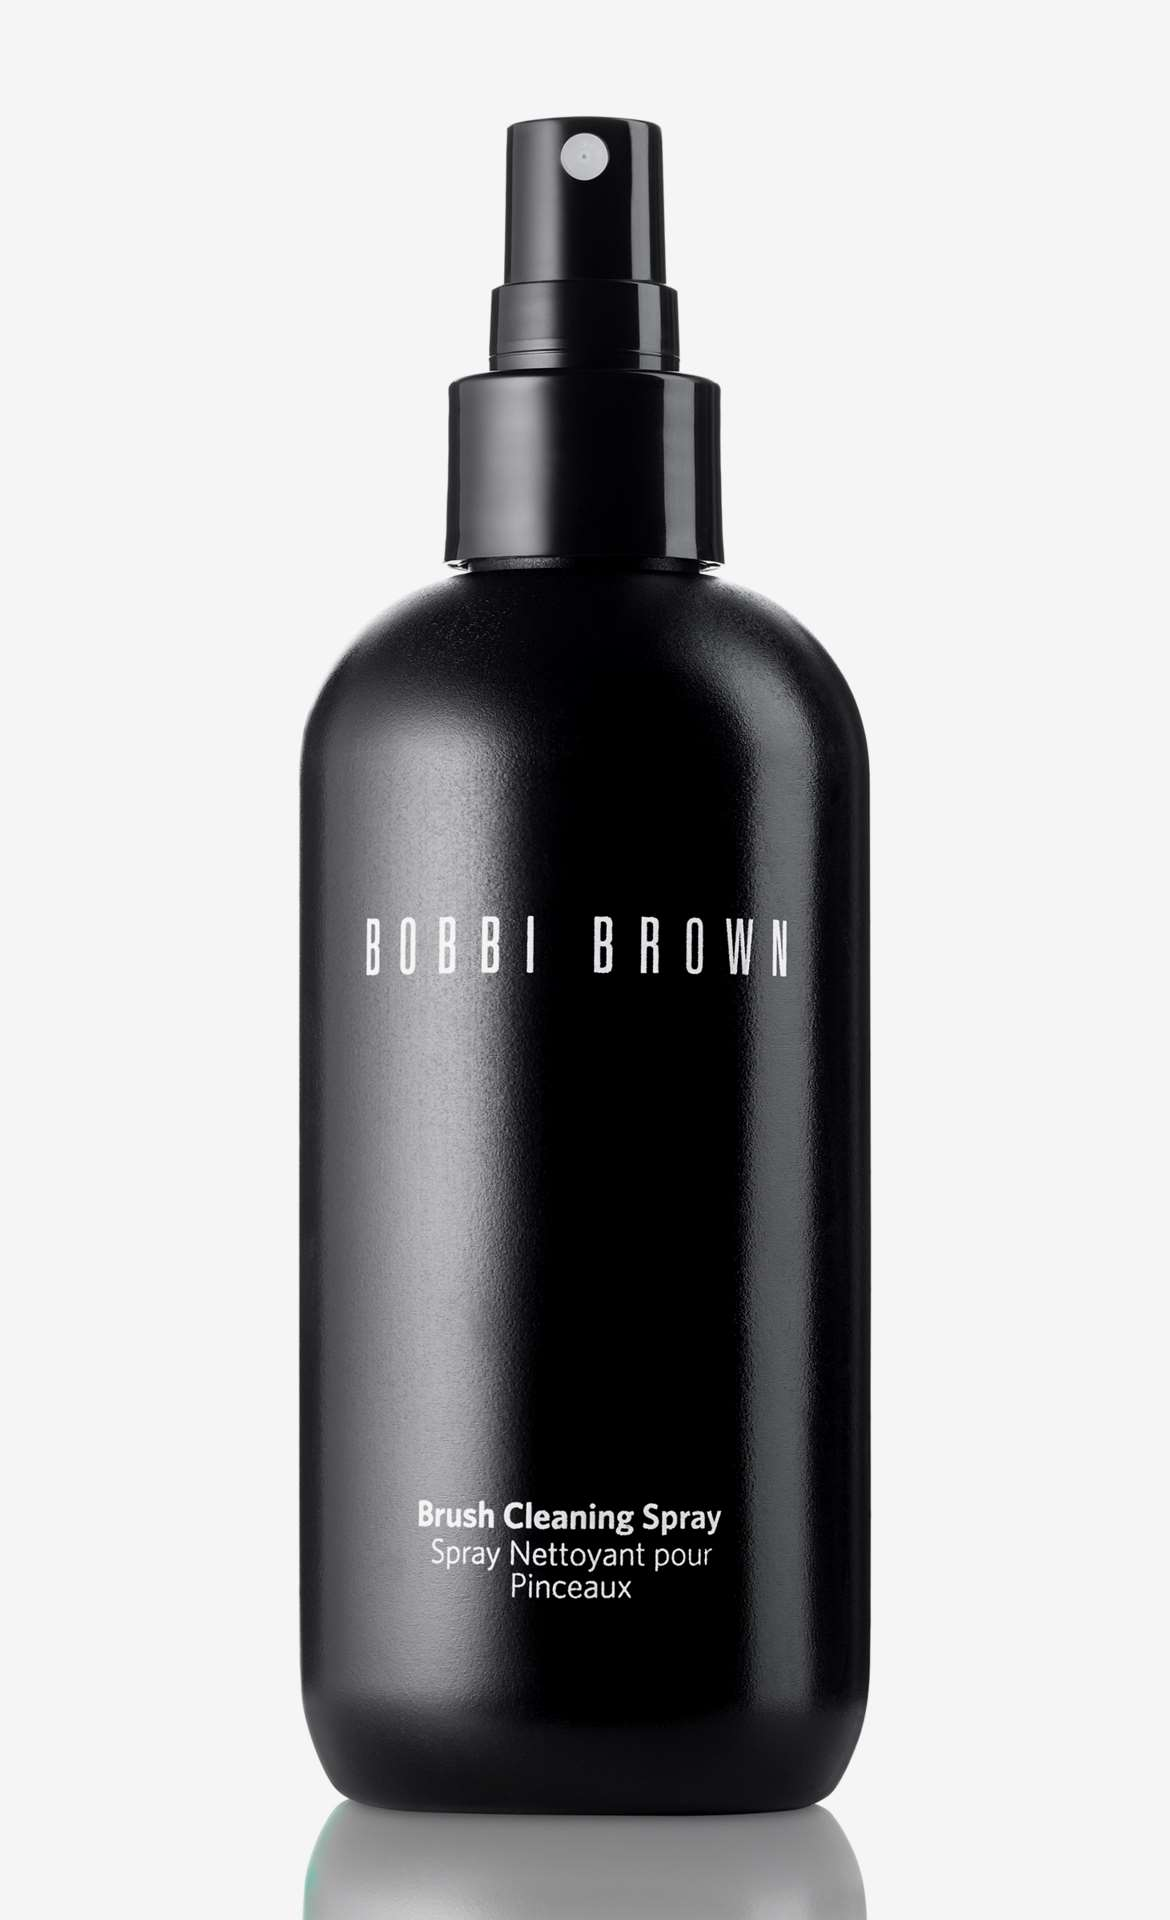 0716170219028 - Tvätta sminkborstar